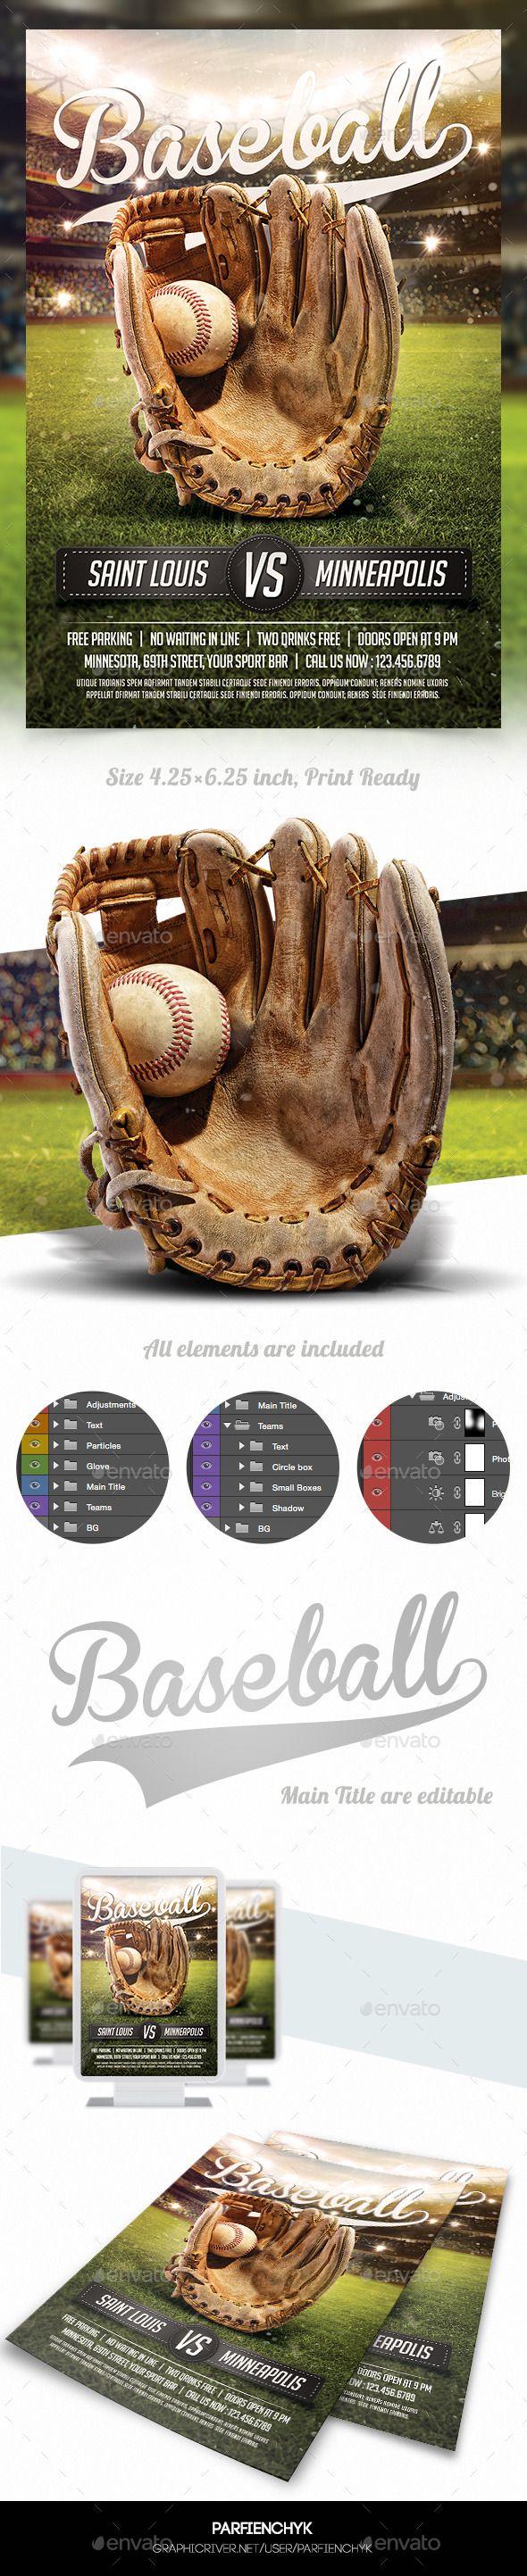 Baseball Game Flyer Template  Baseball Games Flyer Template And